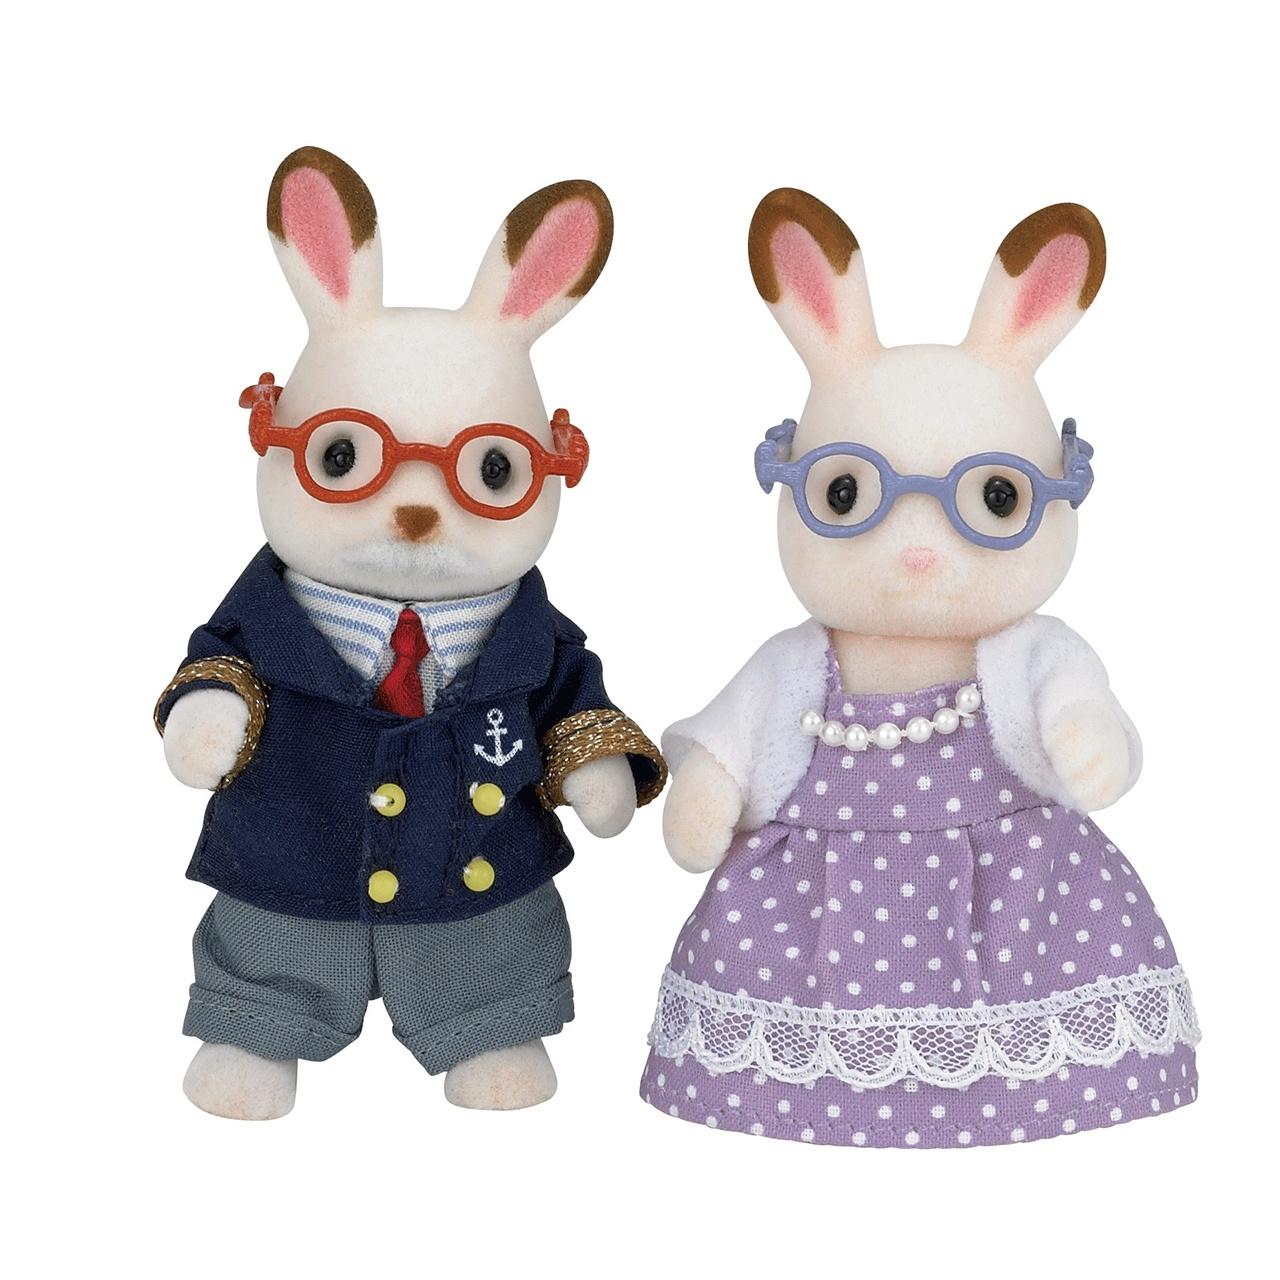 Sylvanian Families Chocolate Rabbit Grandparents Set £13.74 at Jac in a Box